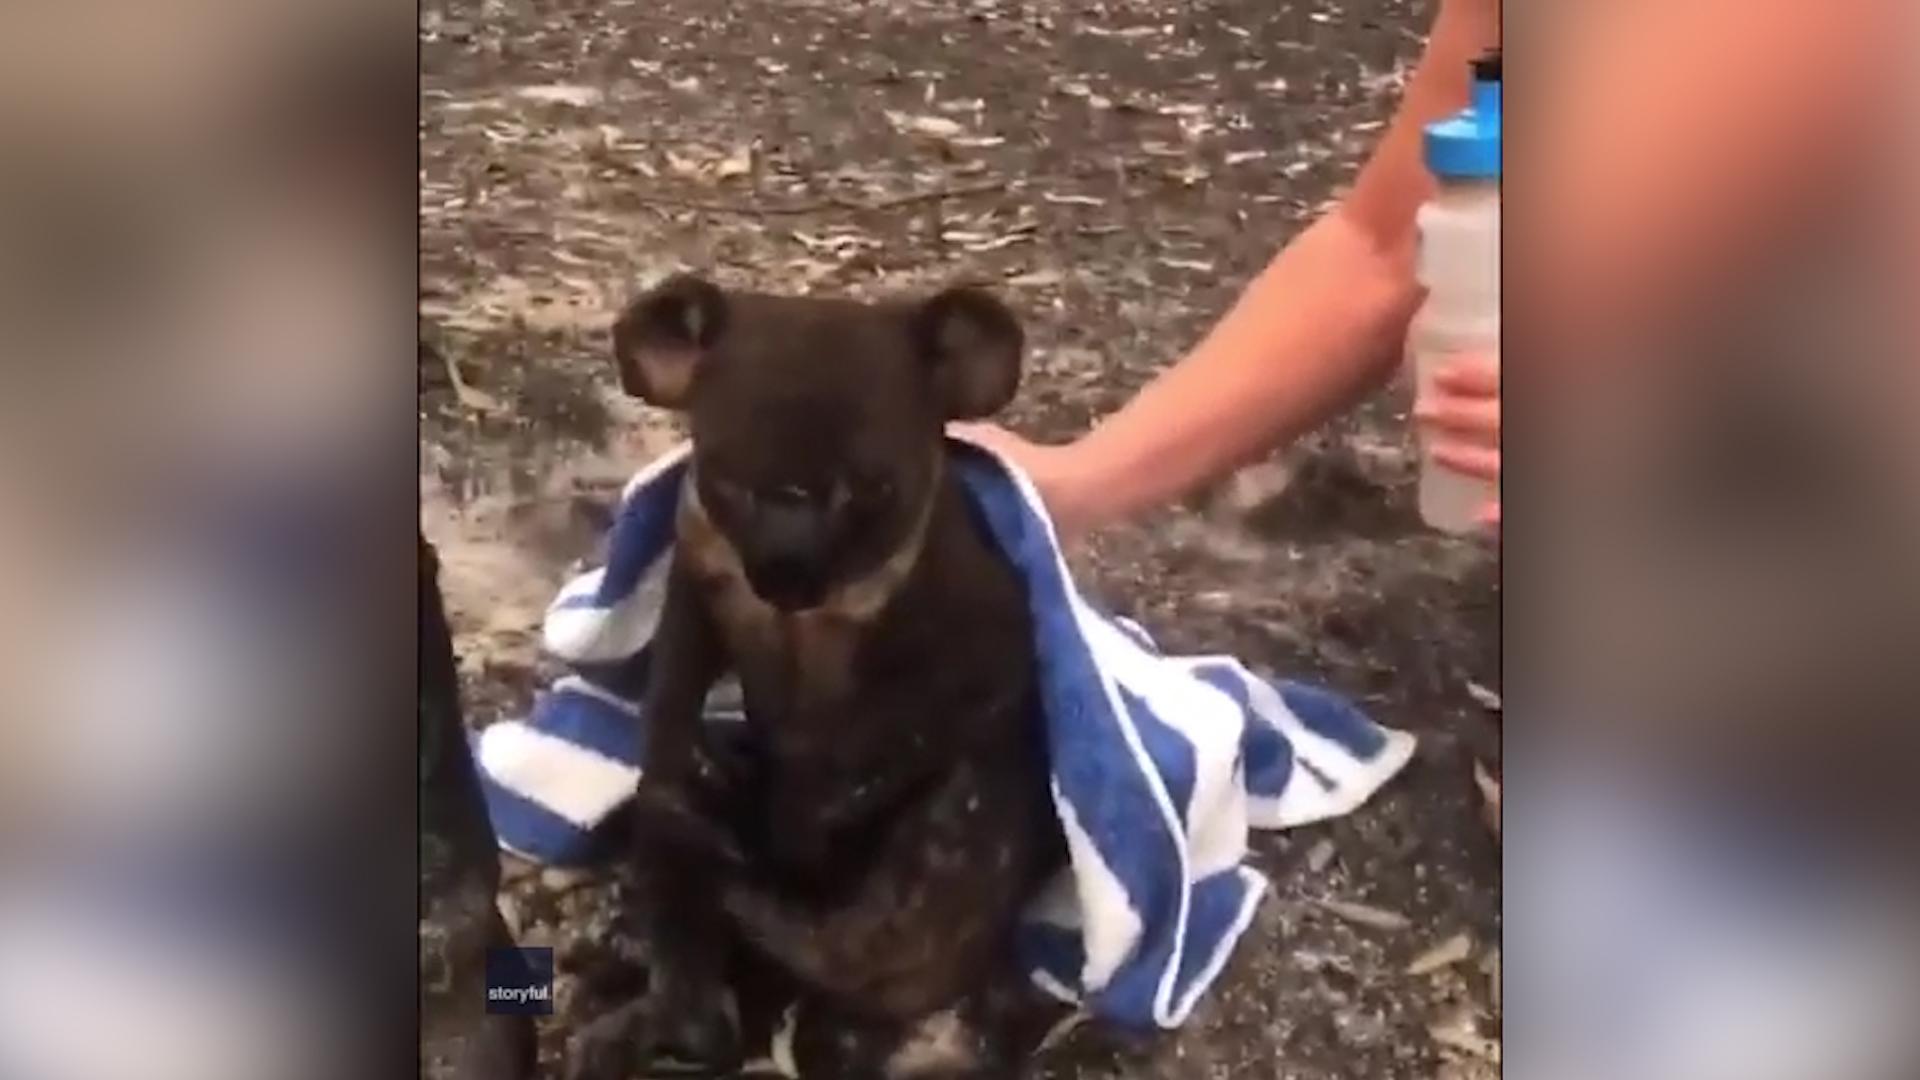 Koala salvat din incendiu, Sursa Washington Post